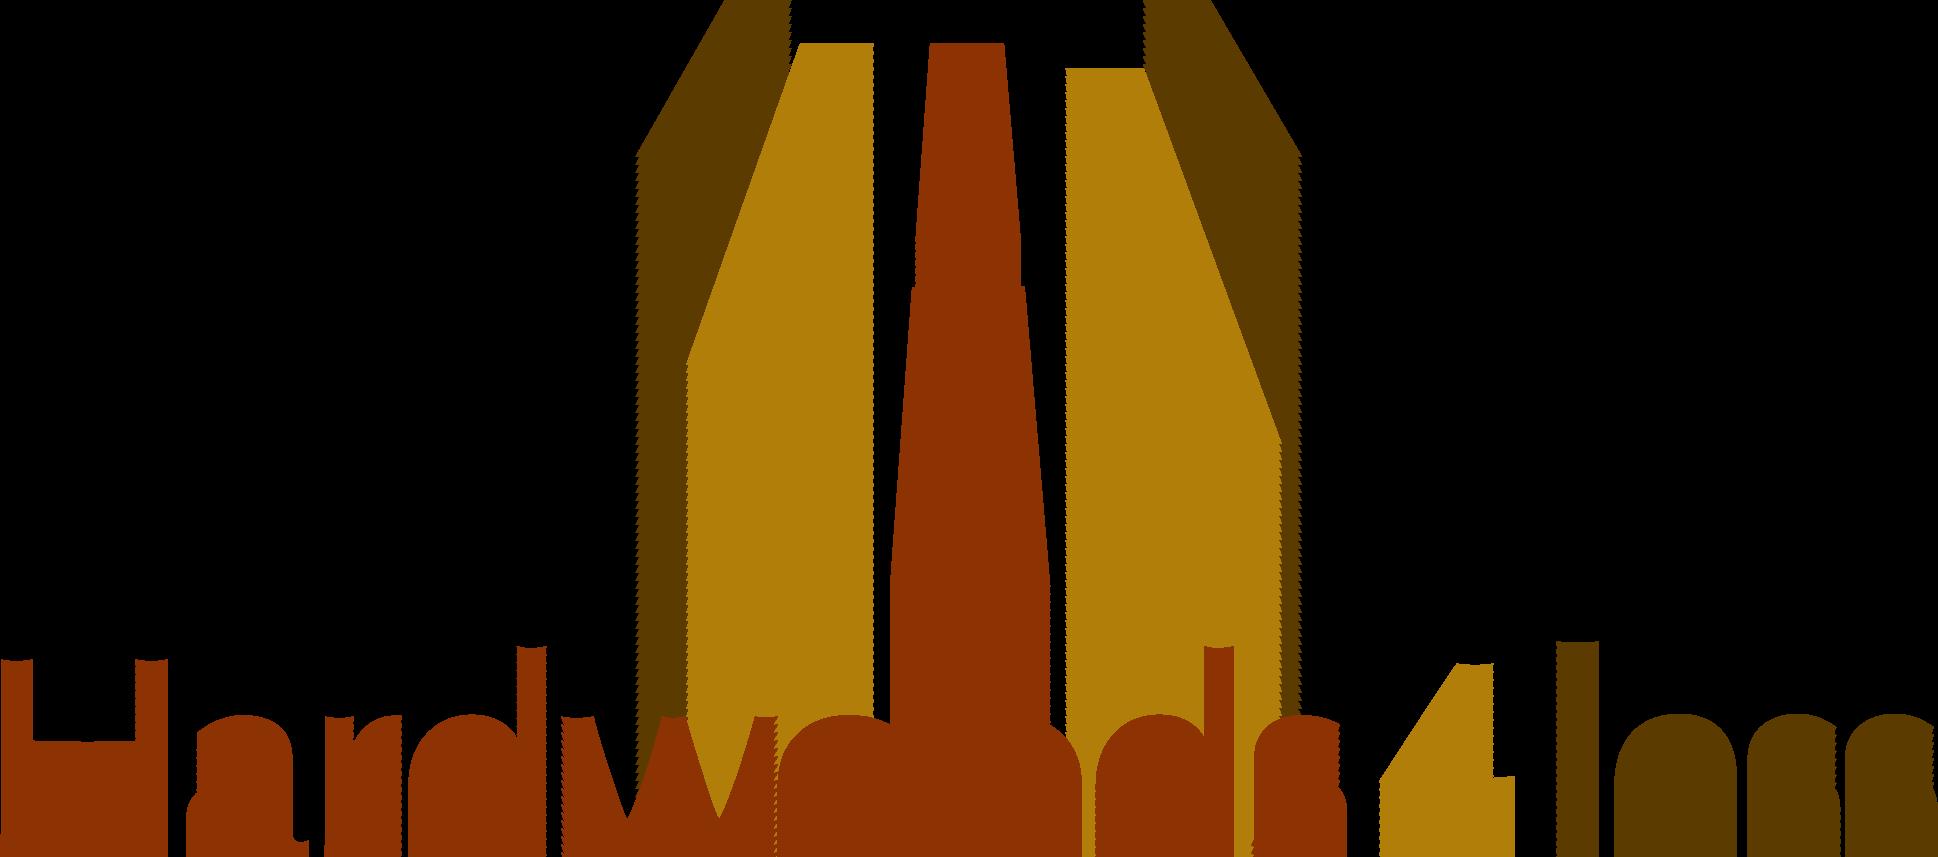 Hardwoods4less 5 X 3 4 Brazilian Tigerwood Hardwood